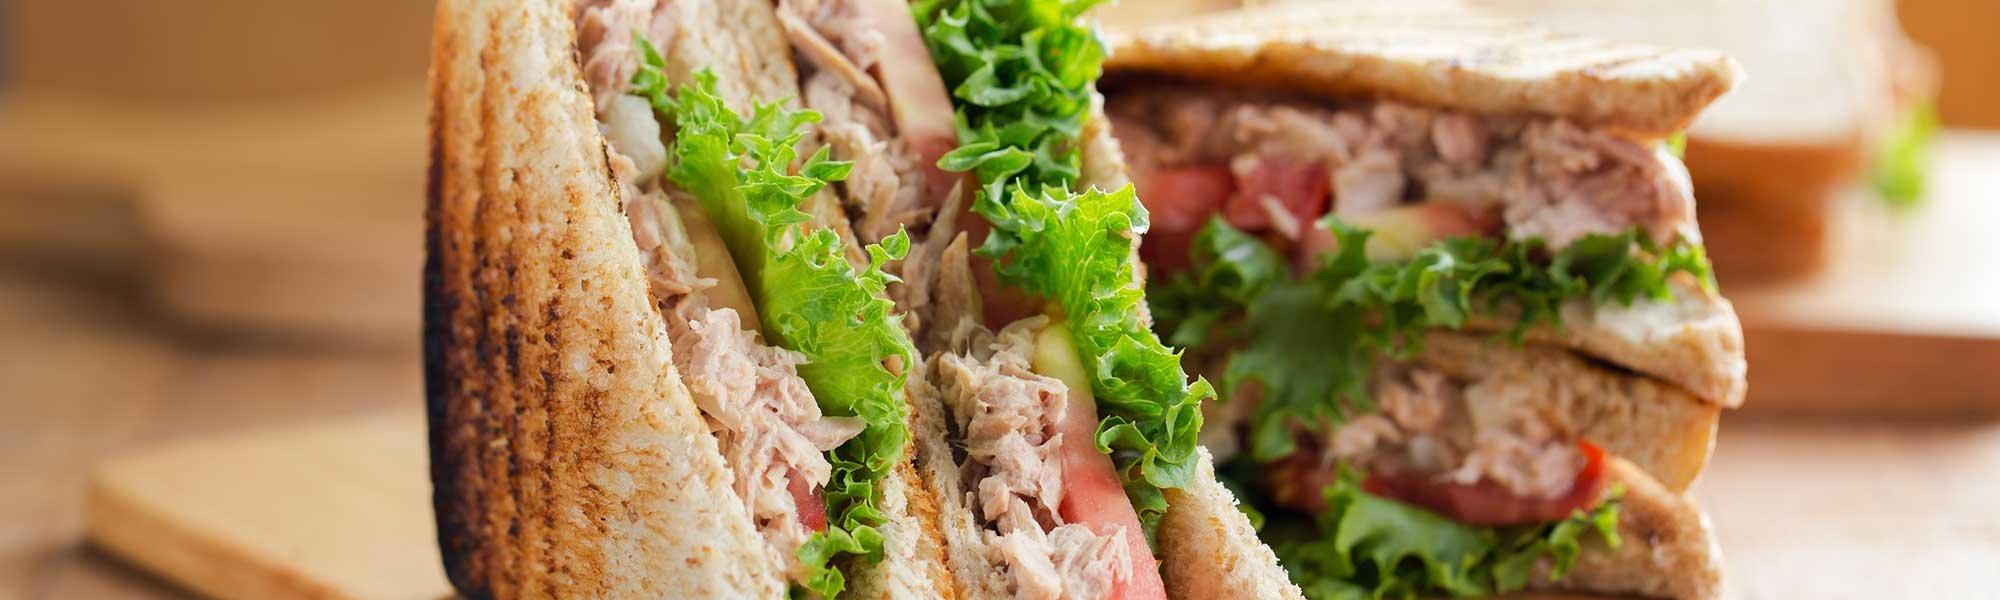 tuna sandwich with tomato and lettuce